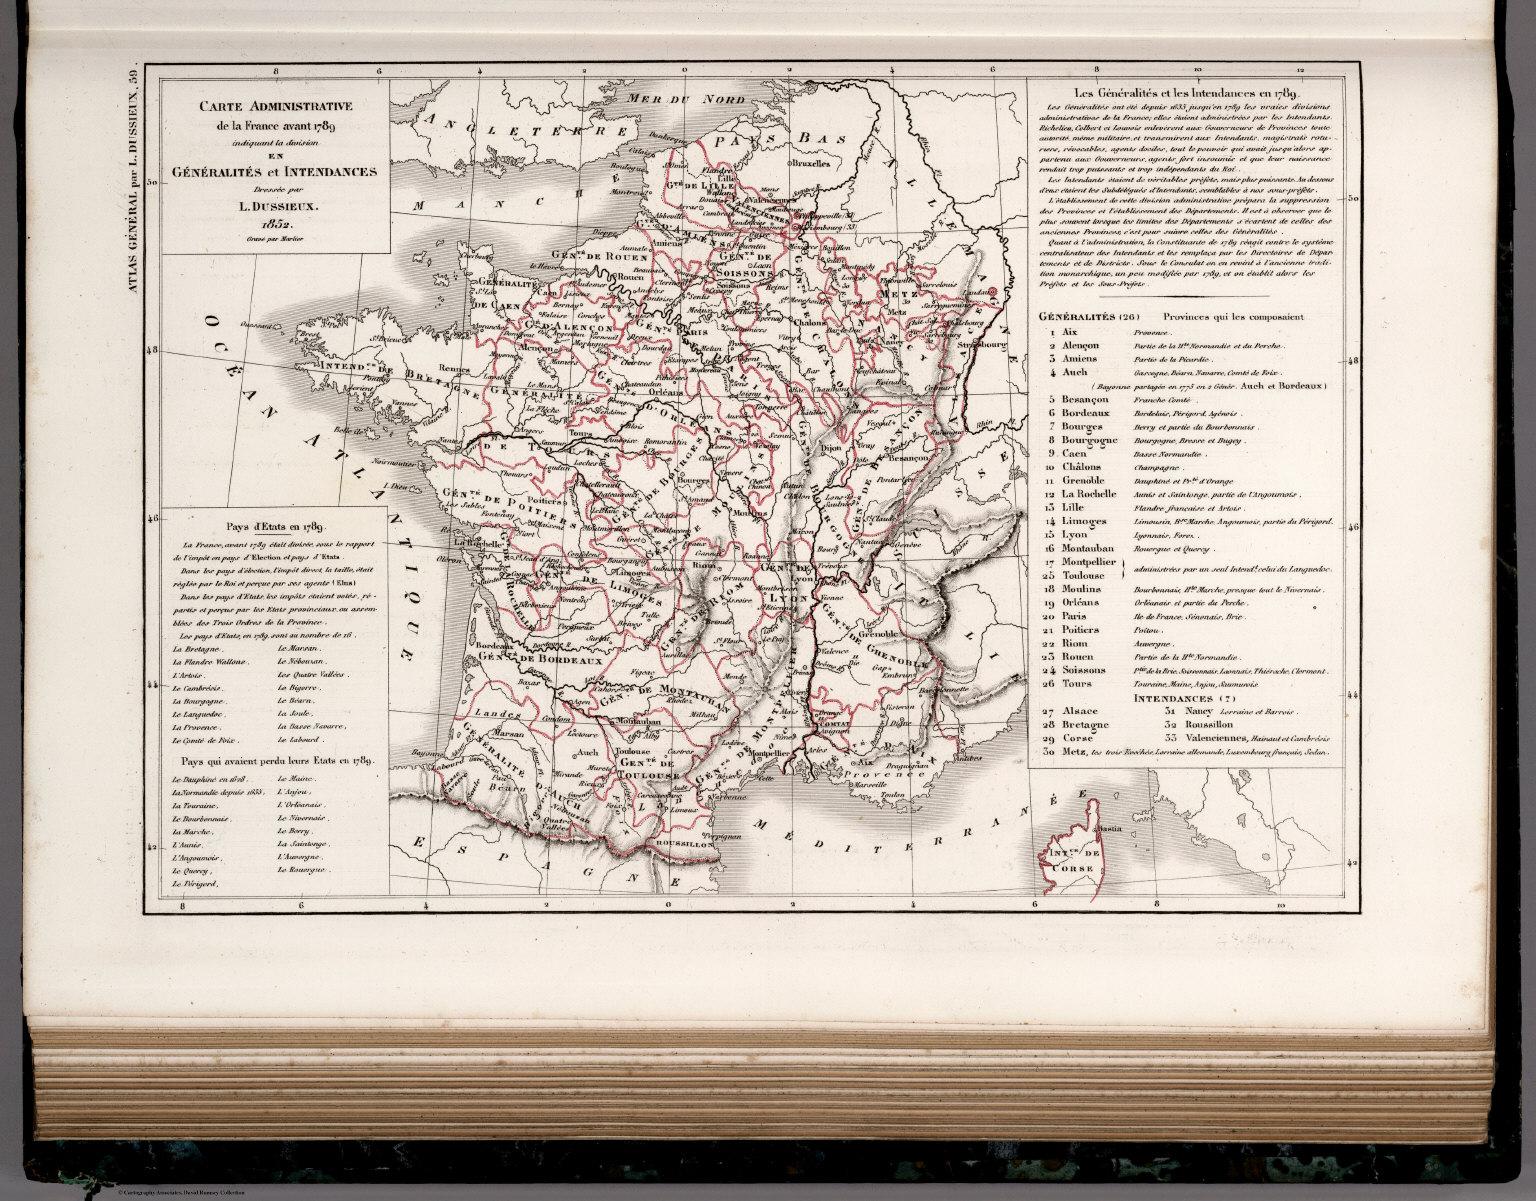 59 Carte Administrative De La France Avant 1789 Generalities Et